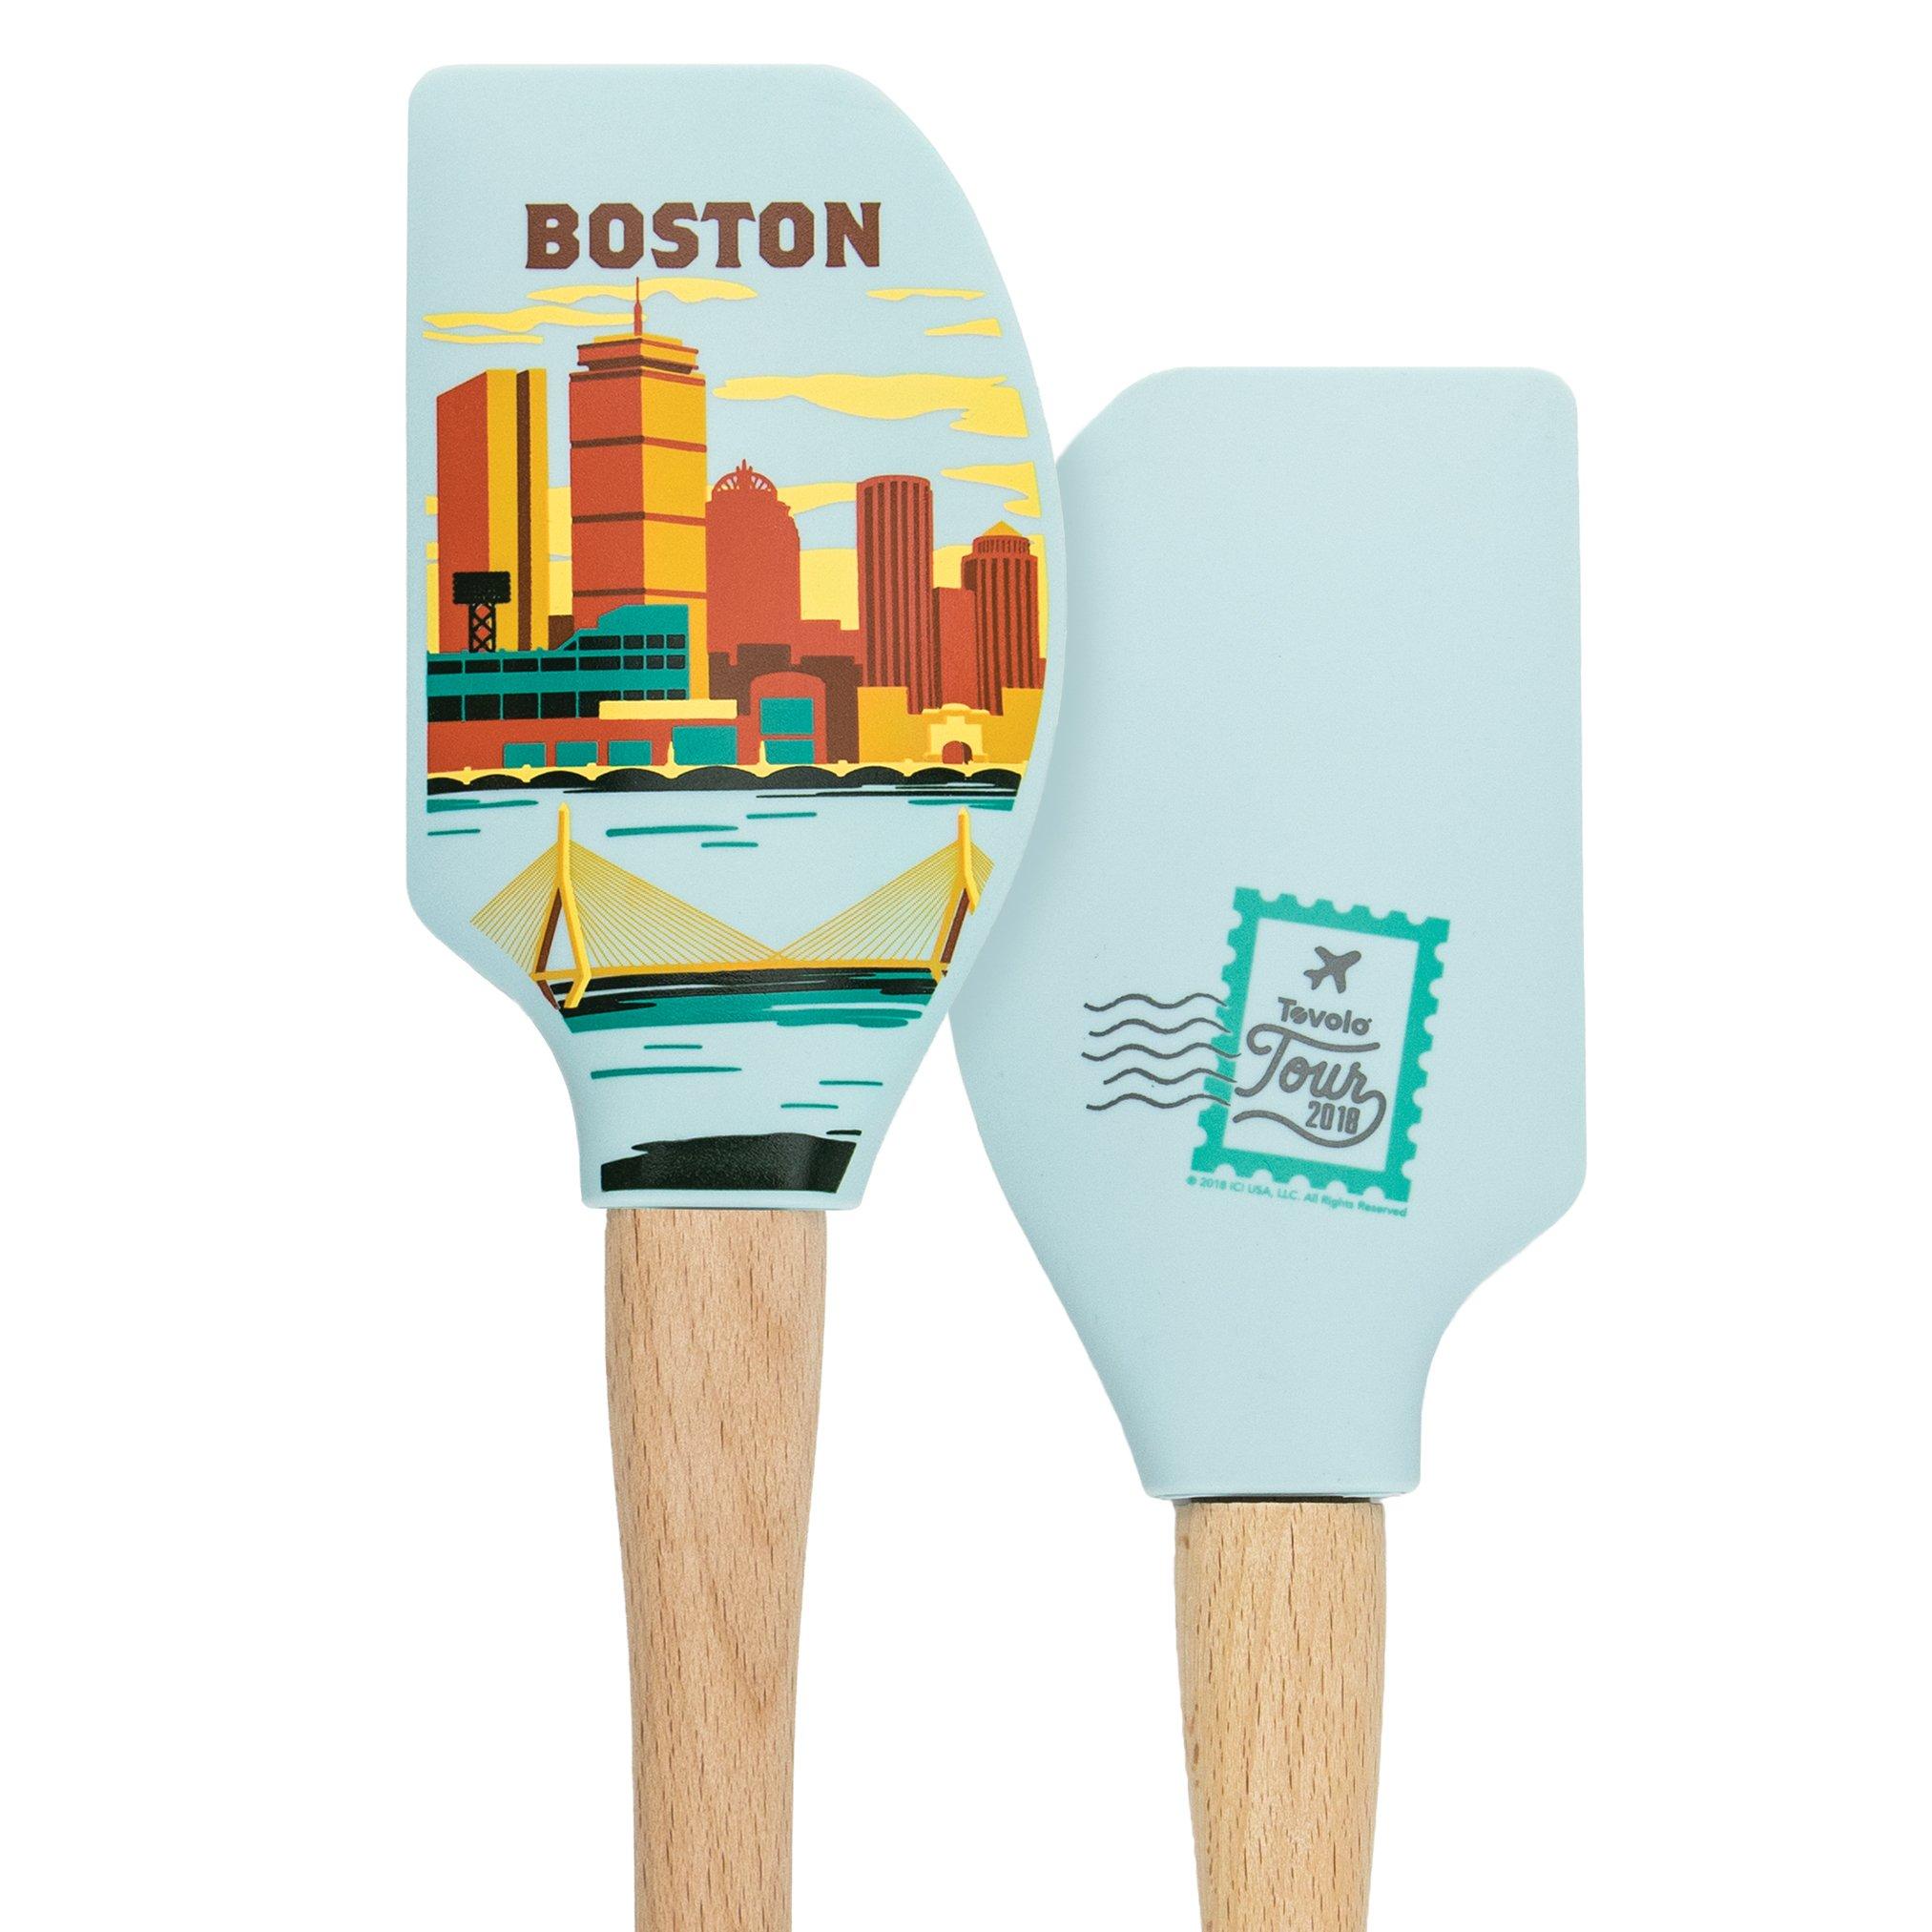 Tovolo 81-28432 Boston Spatulas and Turners, One Size, Wood